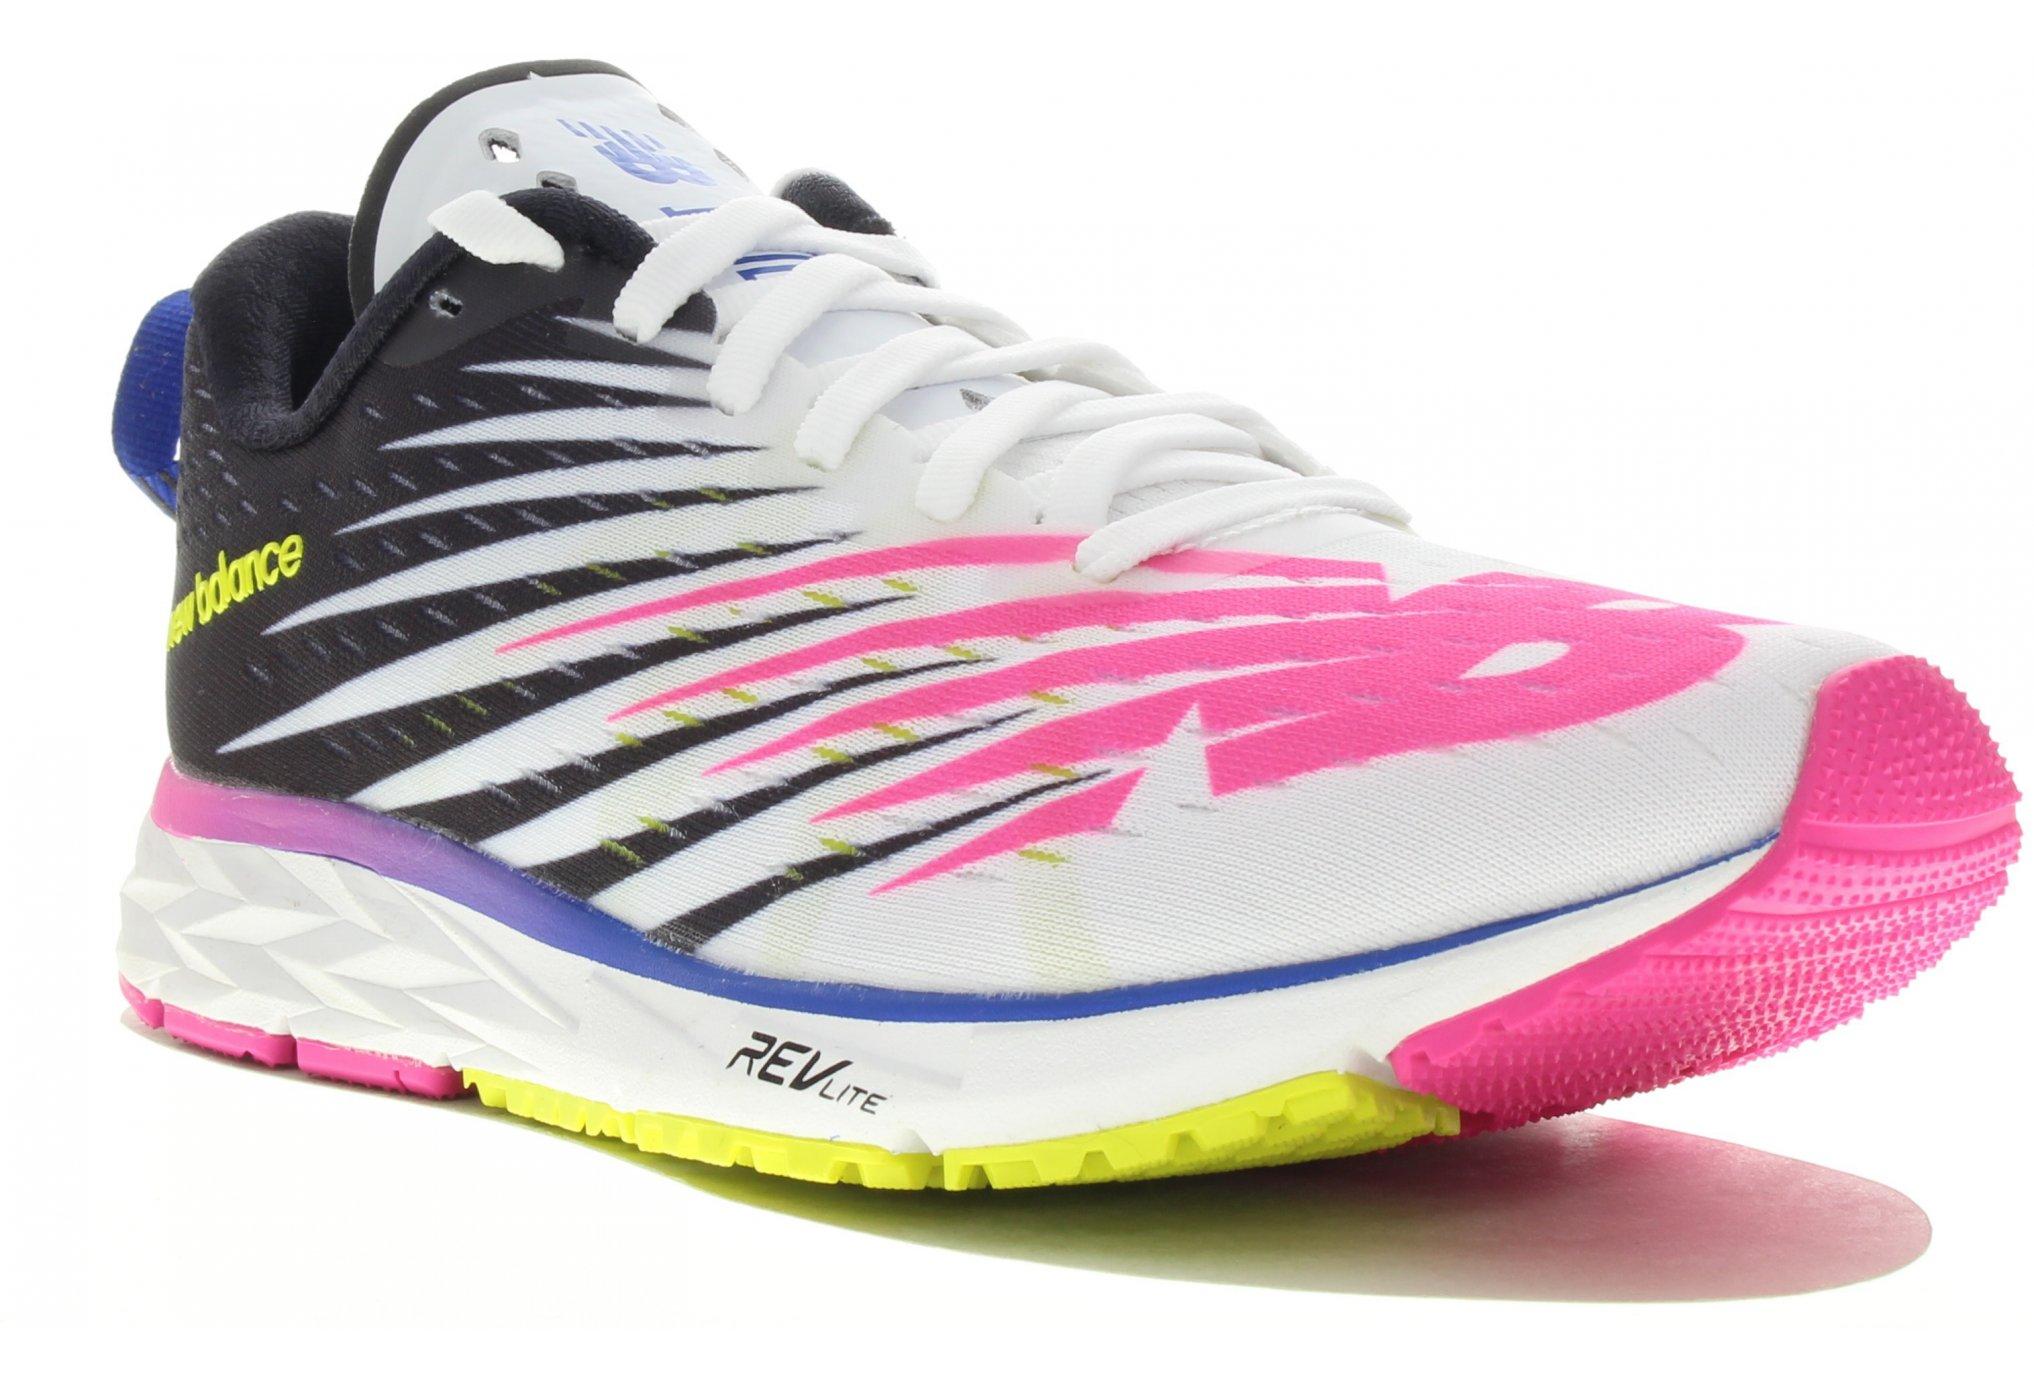 New Balance 1500v5 Chaussures running femme